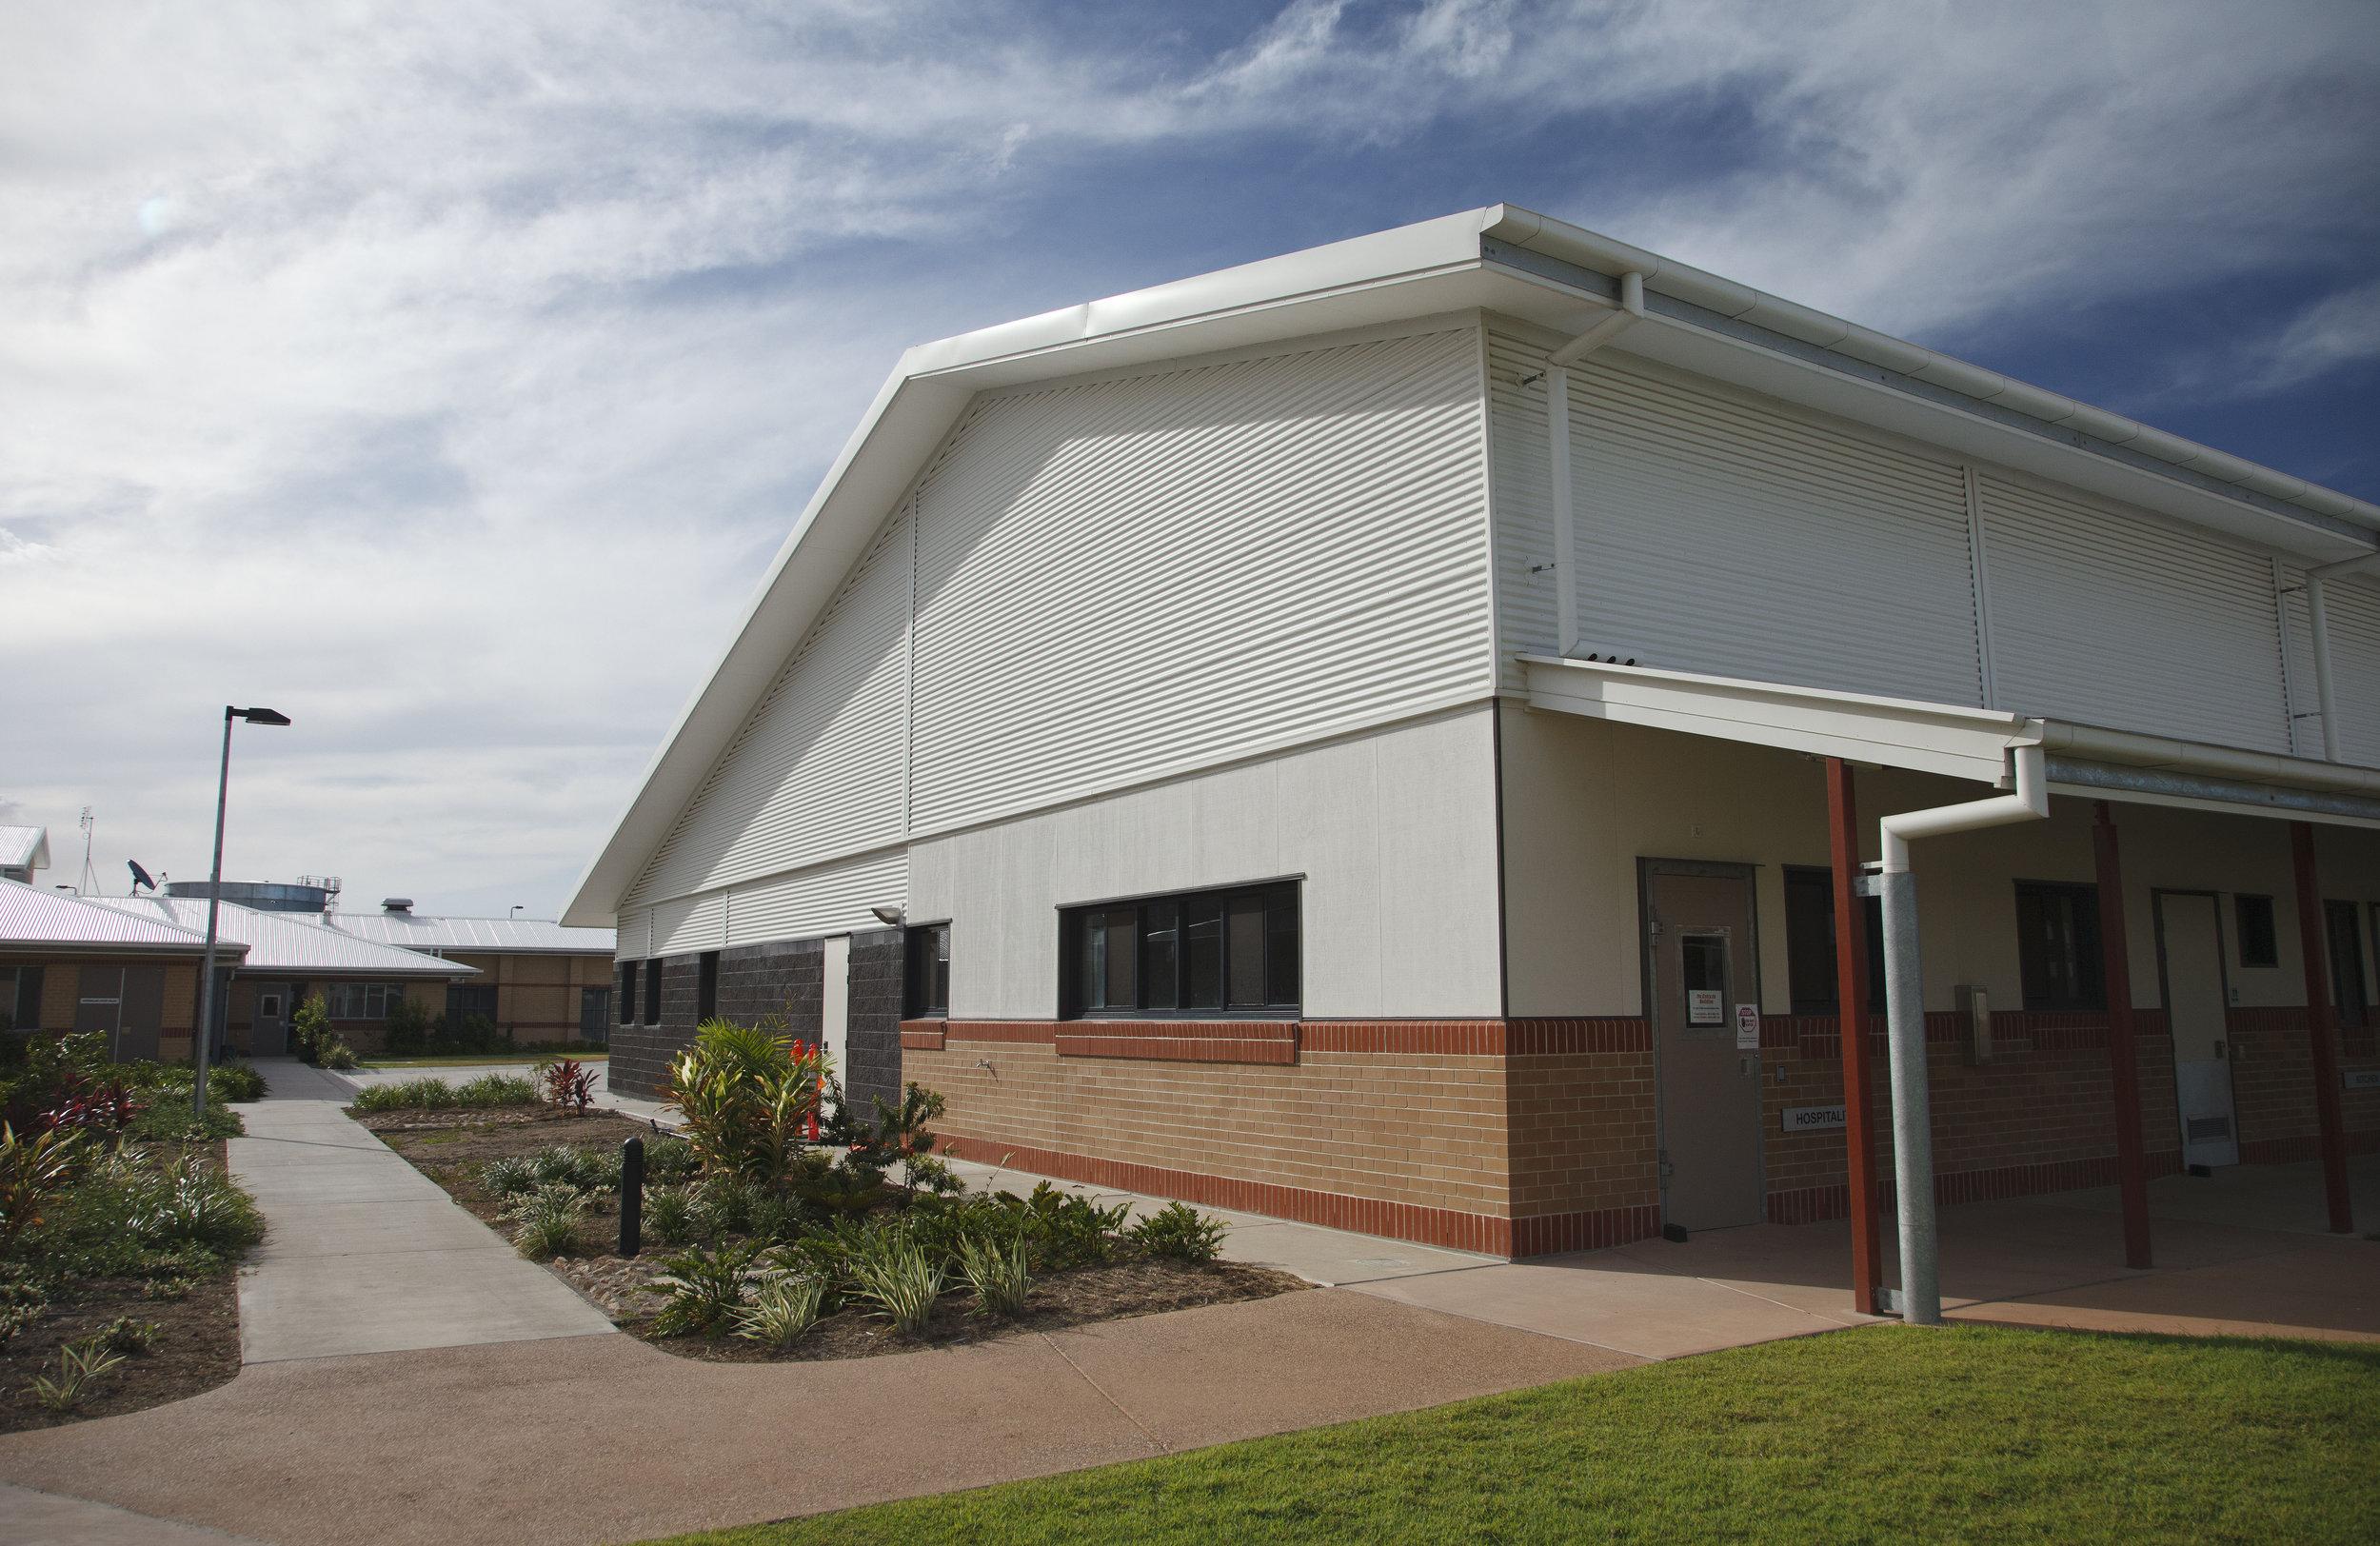 Far-north-qld-youth-detention-guymer-bailey-landscape-4.jpg